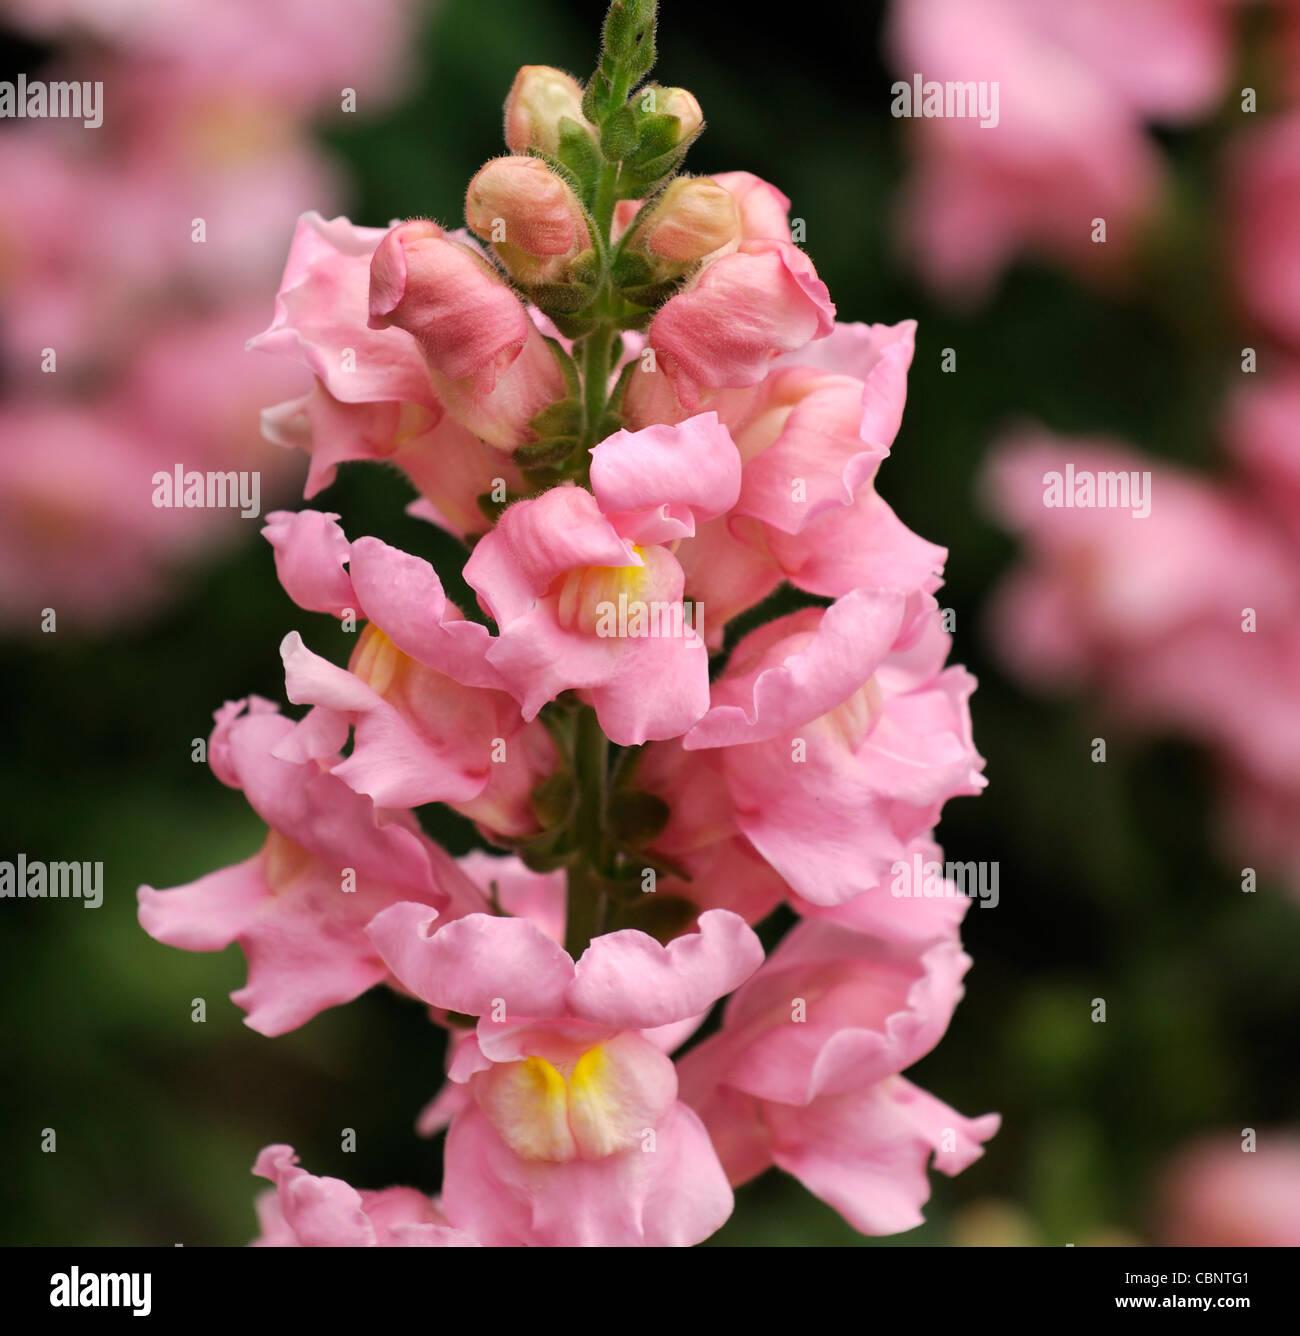 Antirrhinum majus 'Sonnet Pink' snapdragon snapdragons ...